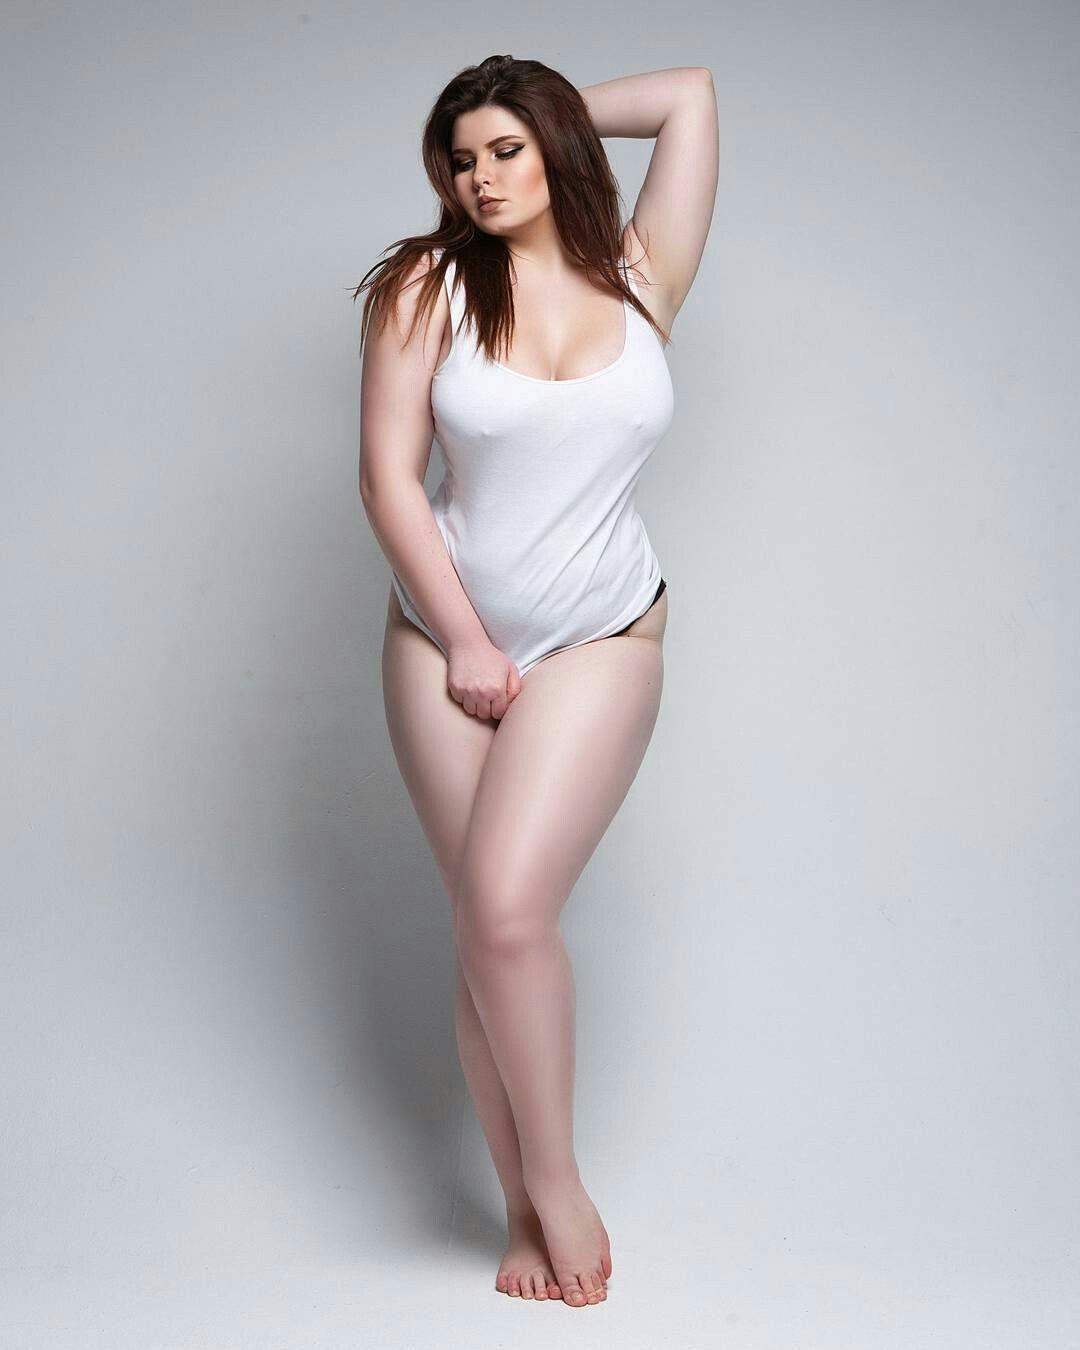 roxxx-busty-premier-model-anna-asian